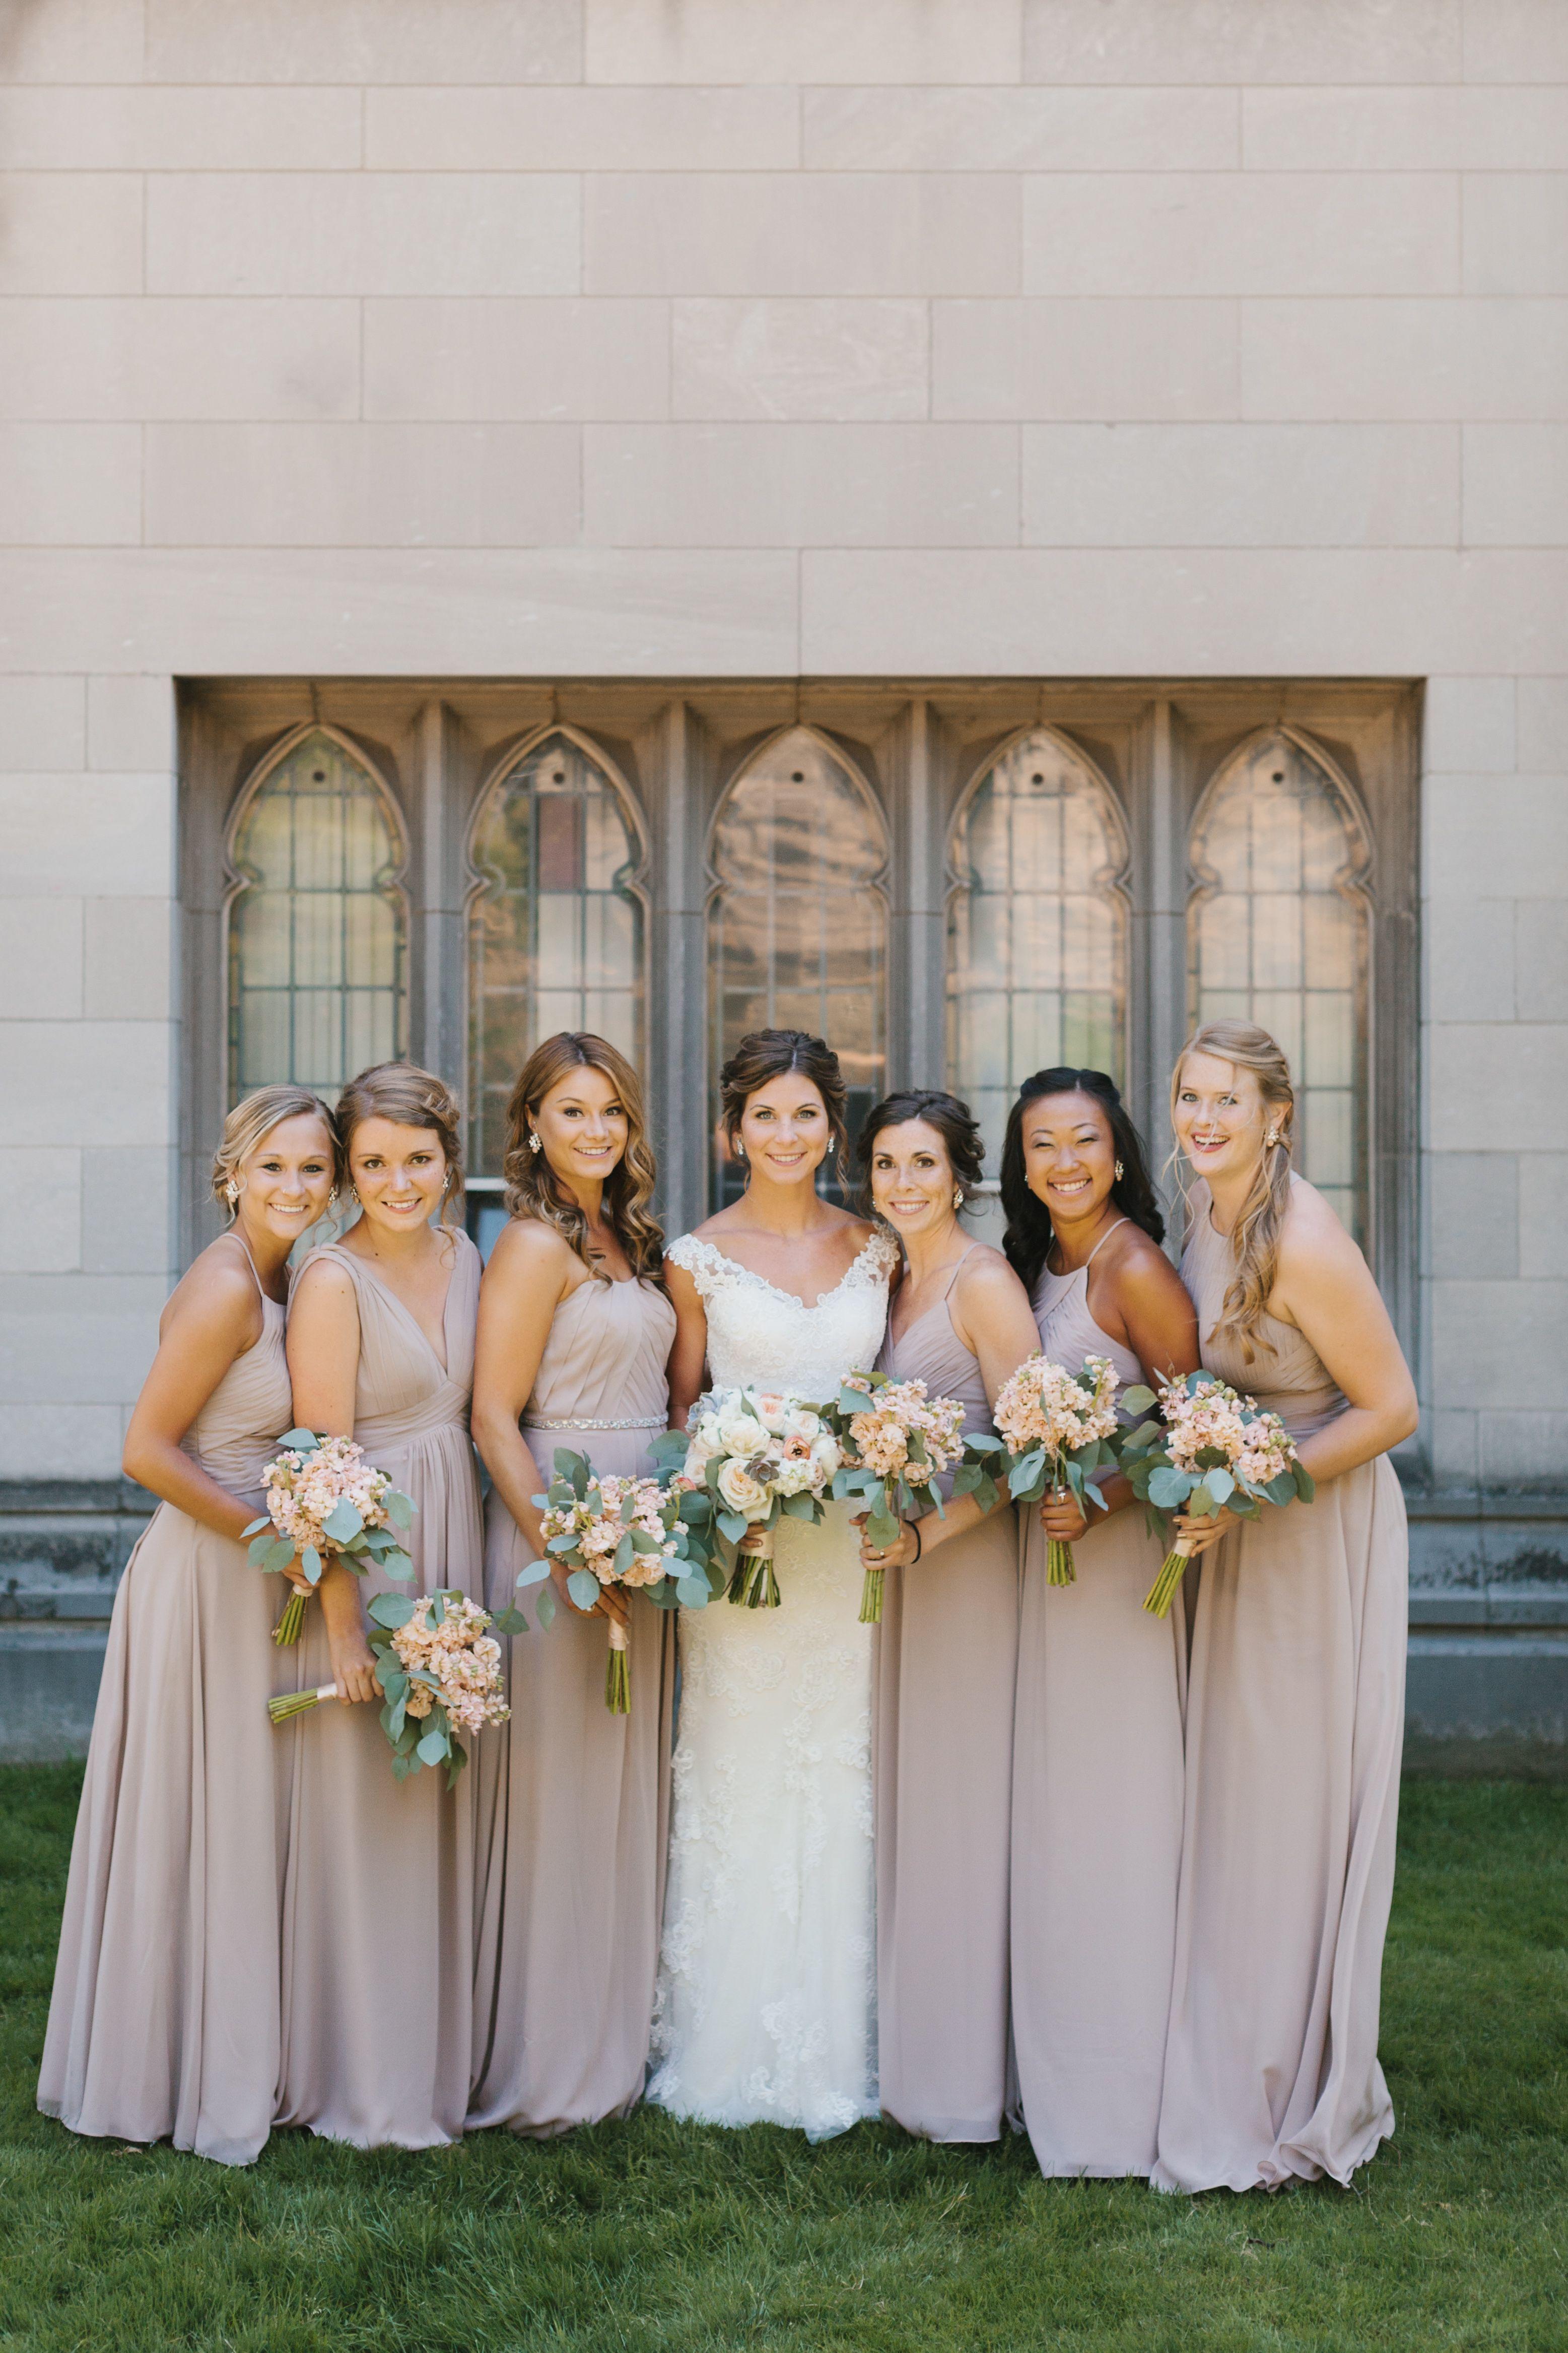 Casablanca bridal bridesmaids inspiration when hosting a